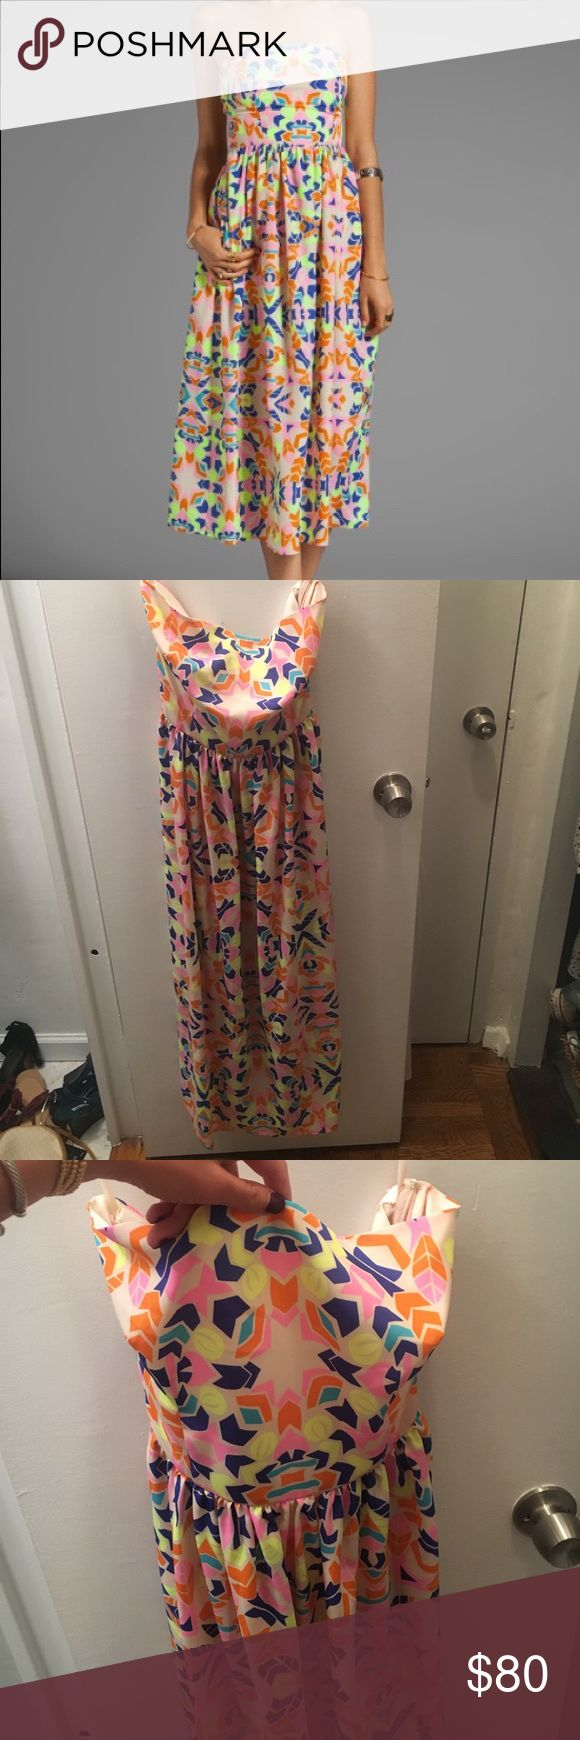 Mara Hoffman Strapless Sundress 100% polyester. New without tags,Mara Hoffman strapless sundress in Aloha Stone Mara Hoffman Dresses Midi